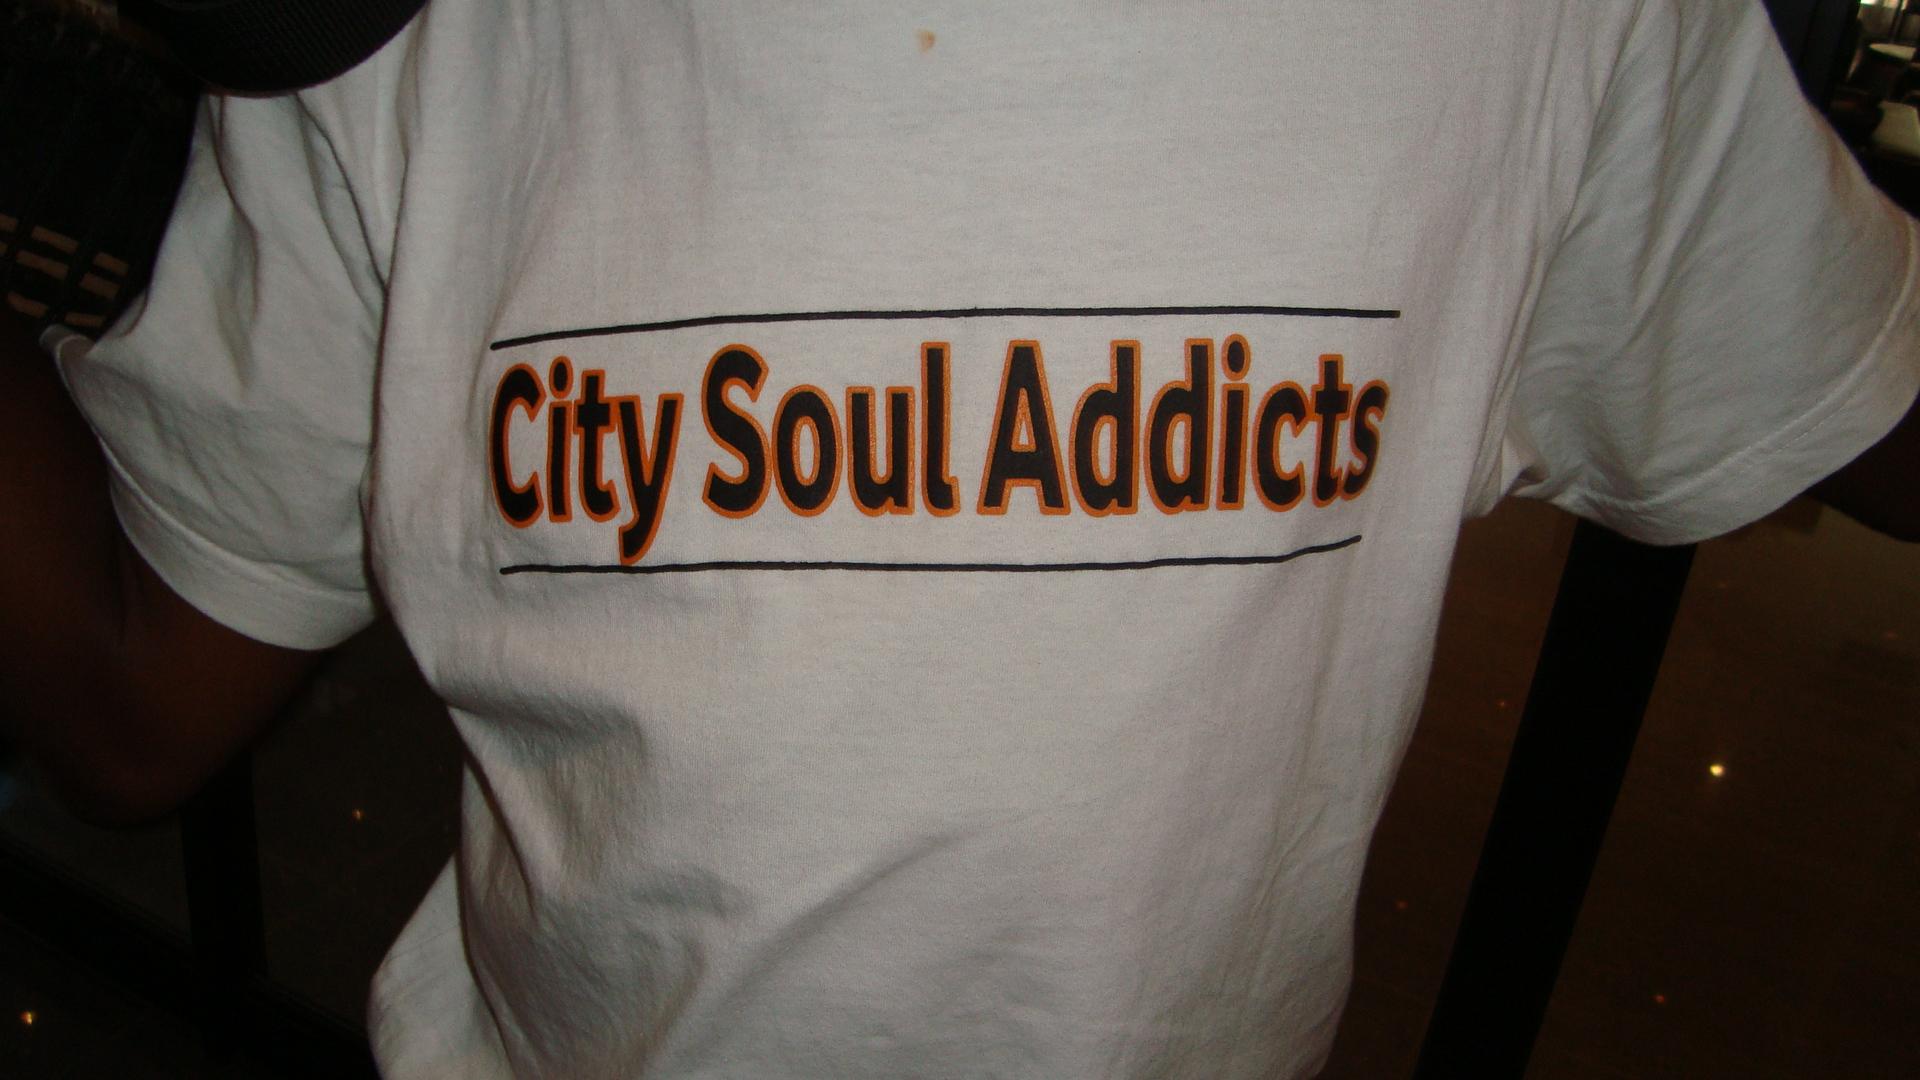 City Soul Addicts image